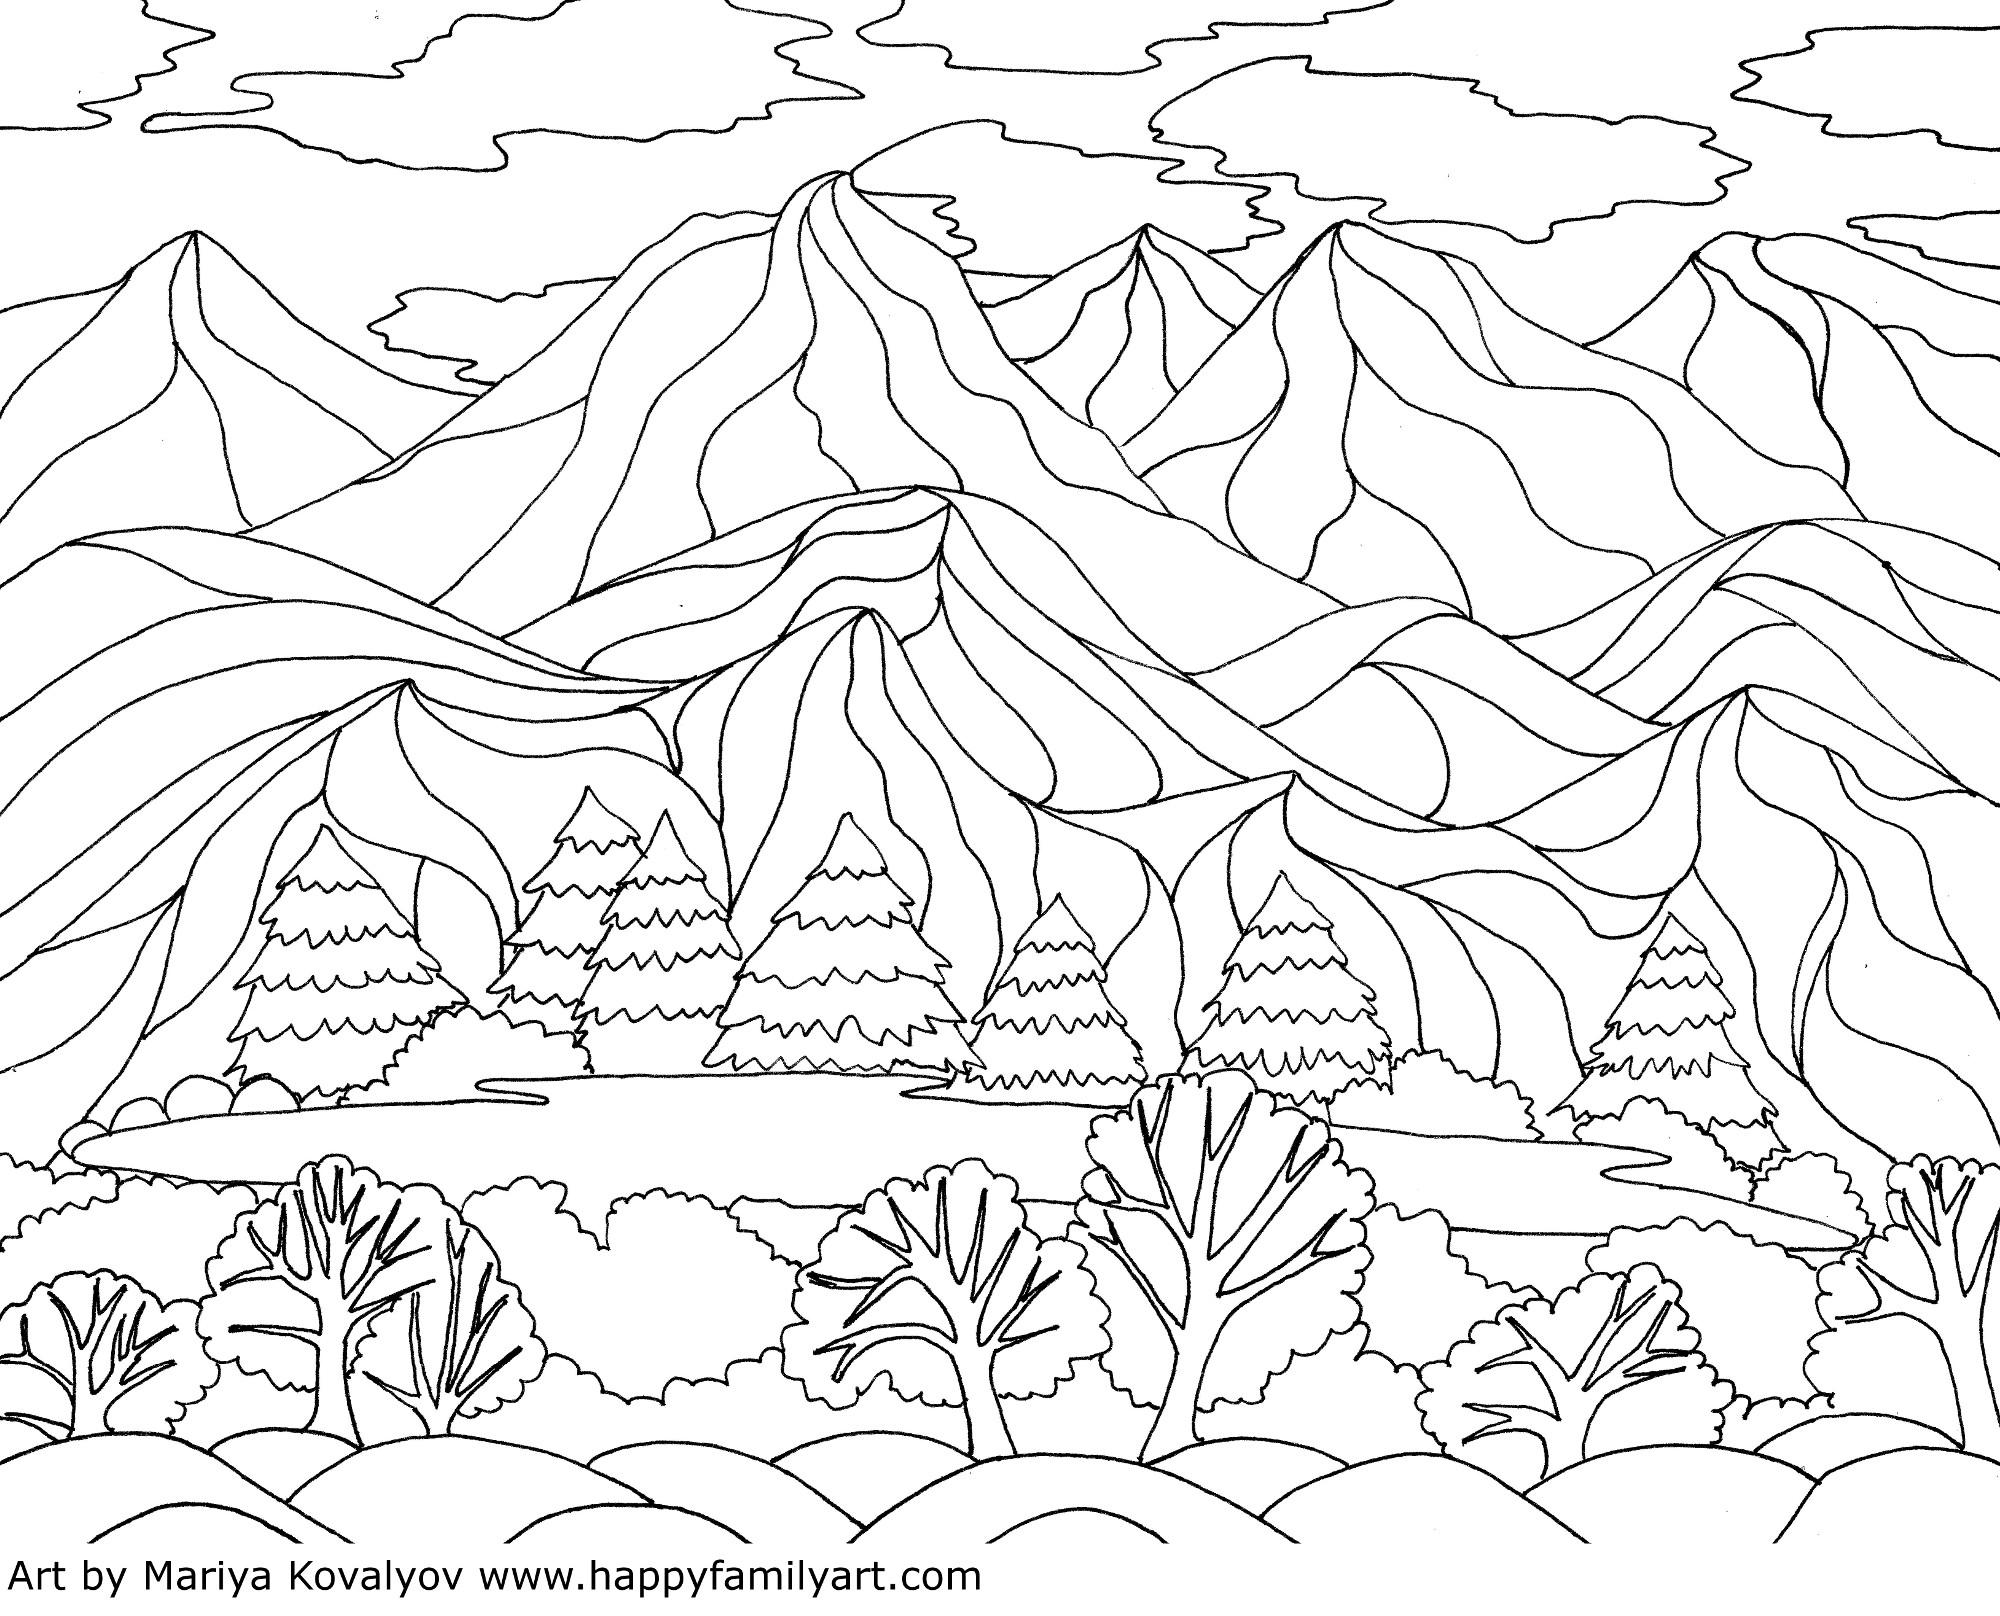 2000x1616 Georgia O#39Keeffe Art History Lesson For Kids